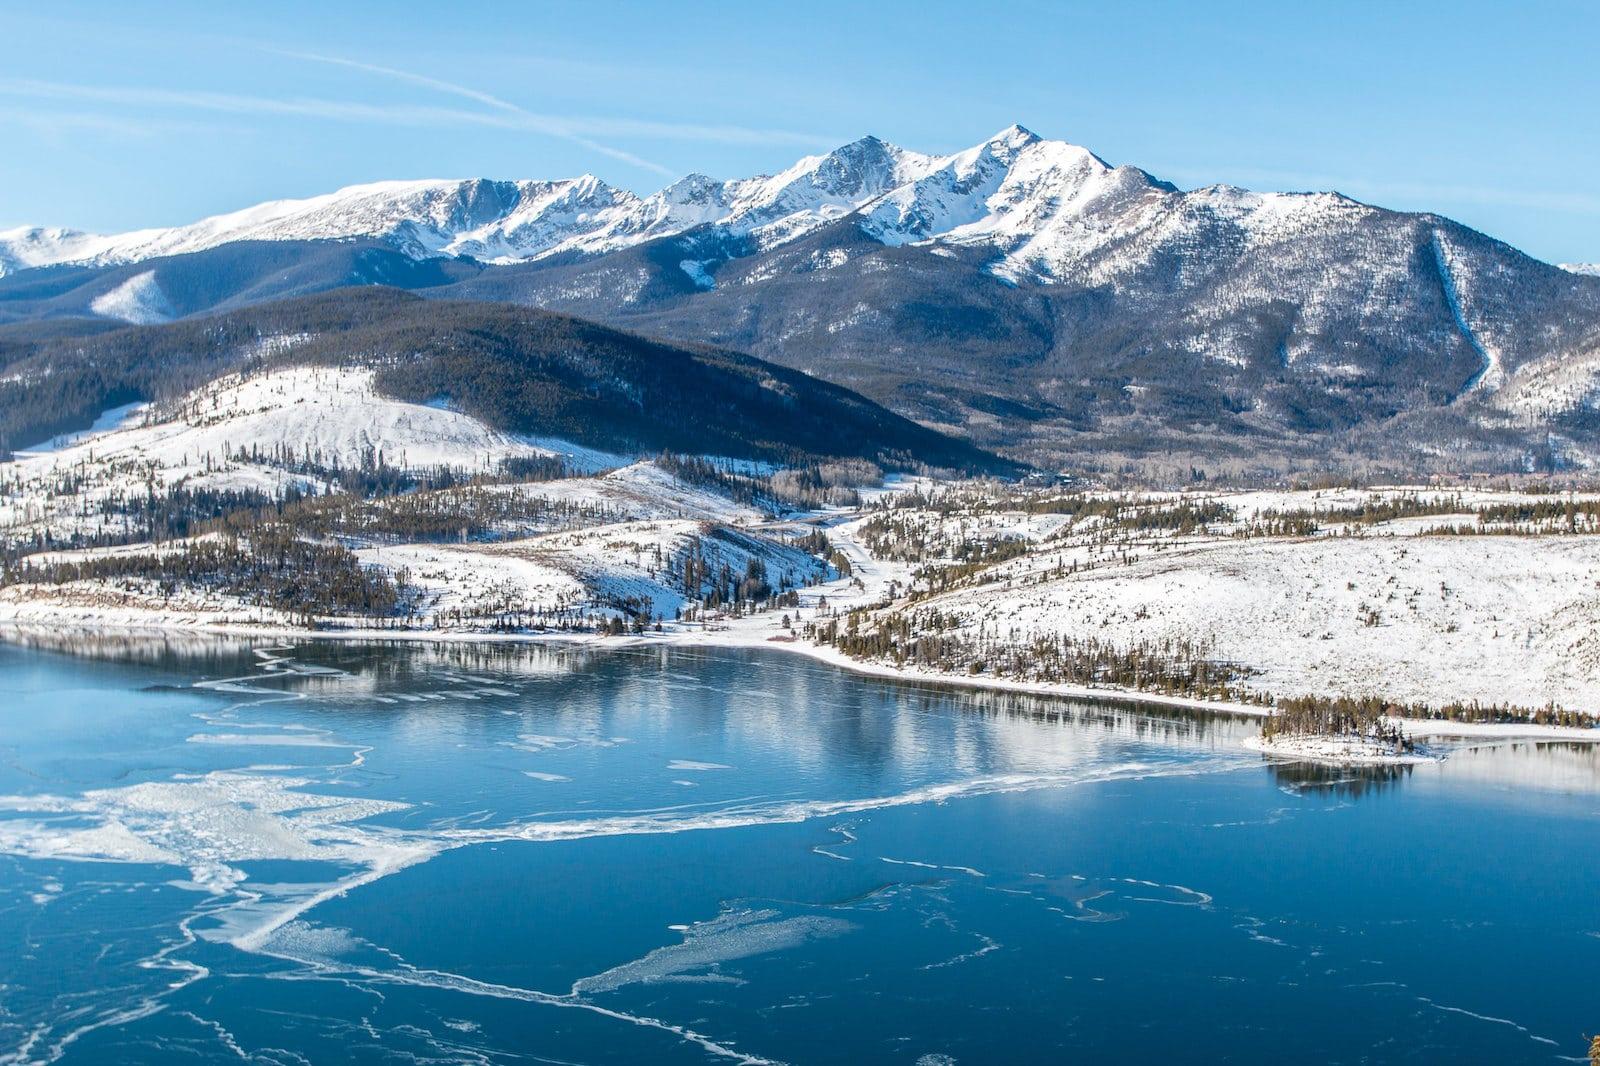 Gambar pegunungan bersalju dan danau beku di Colorado